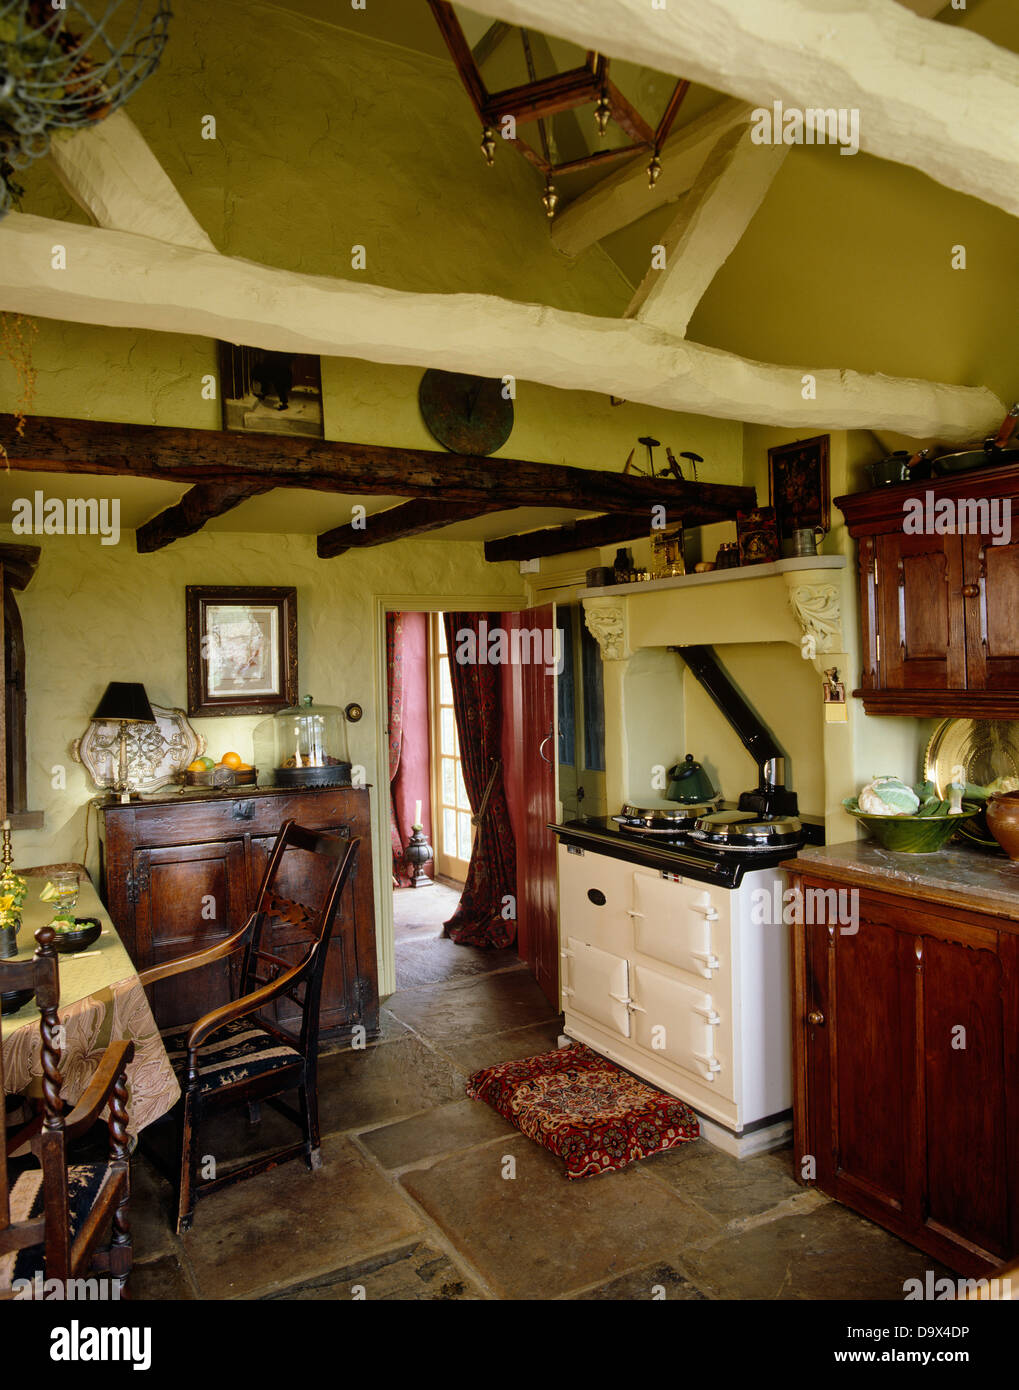 Ceiling Beams Stockfotos & Ceiling Beams Bilder - Alamy